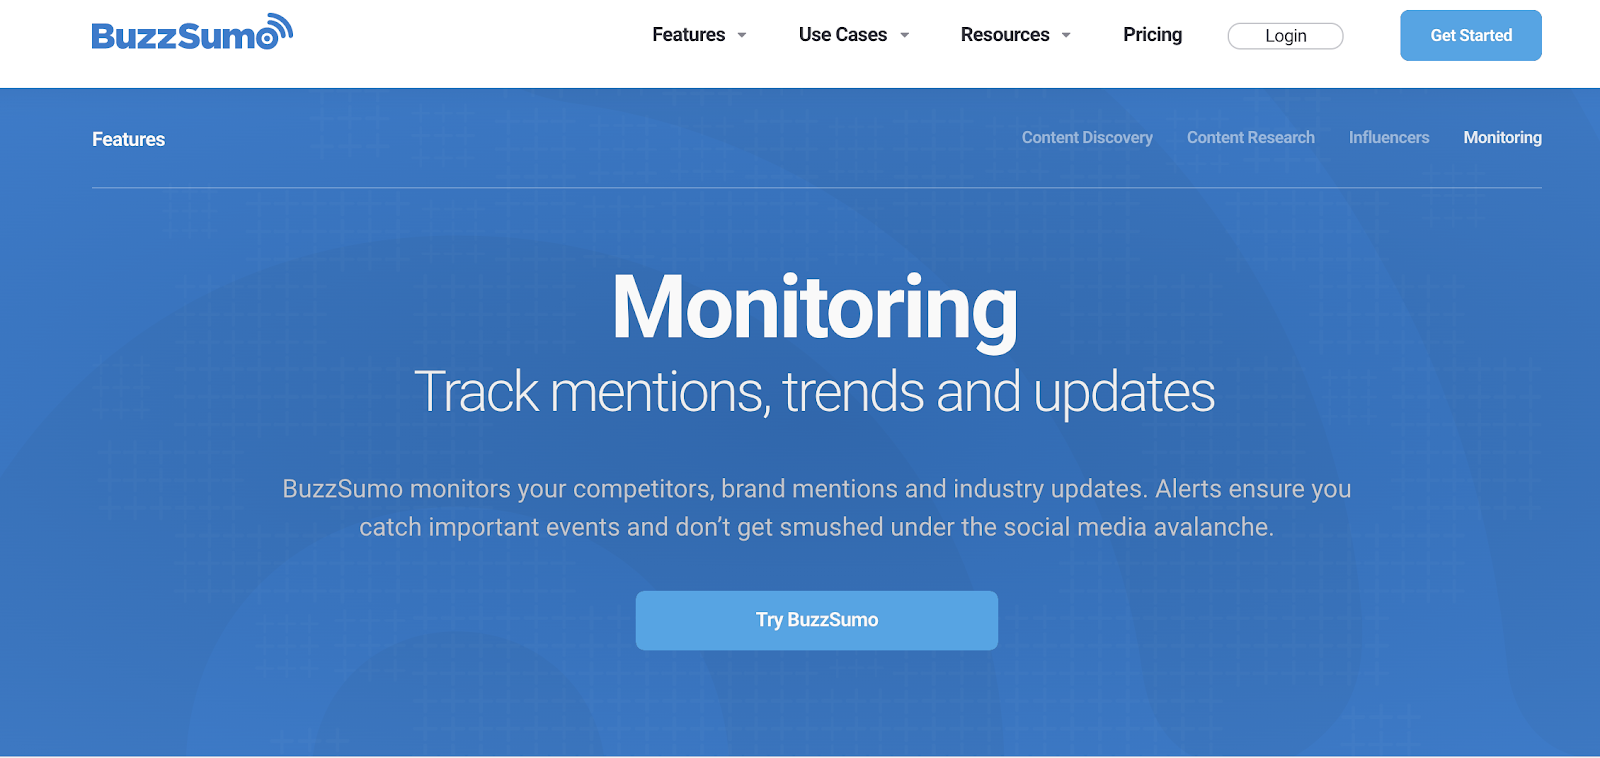 screenshot buzzsume landing page - social media monitoring